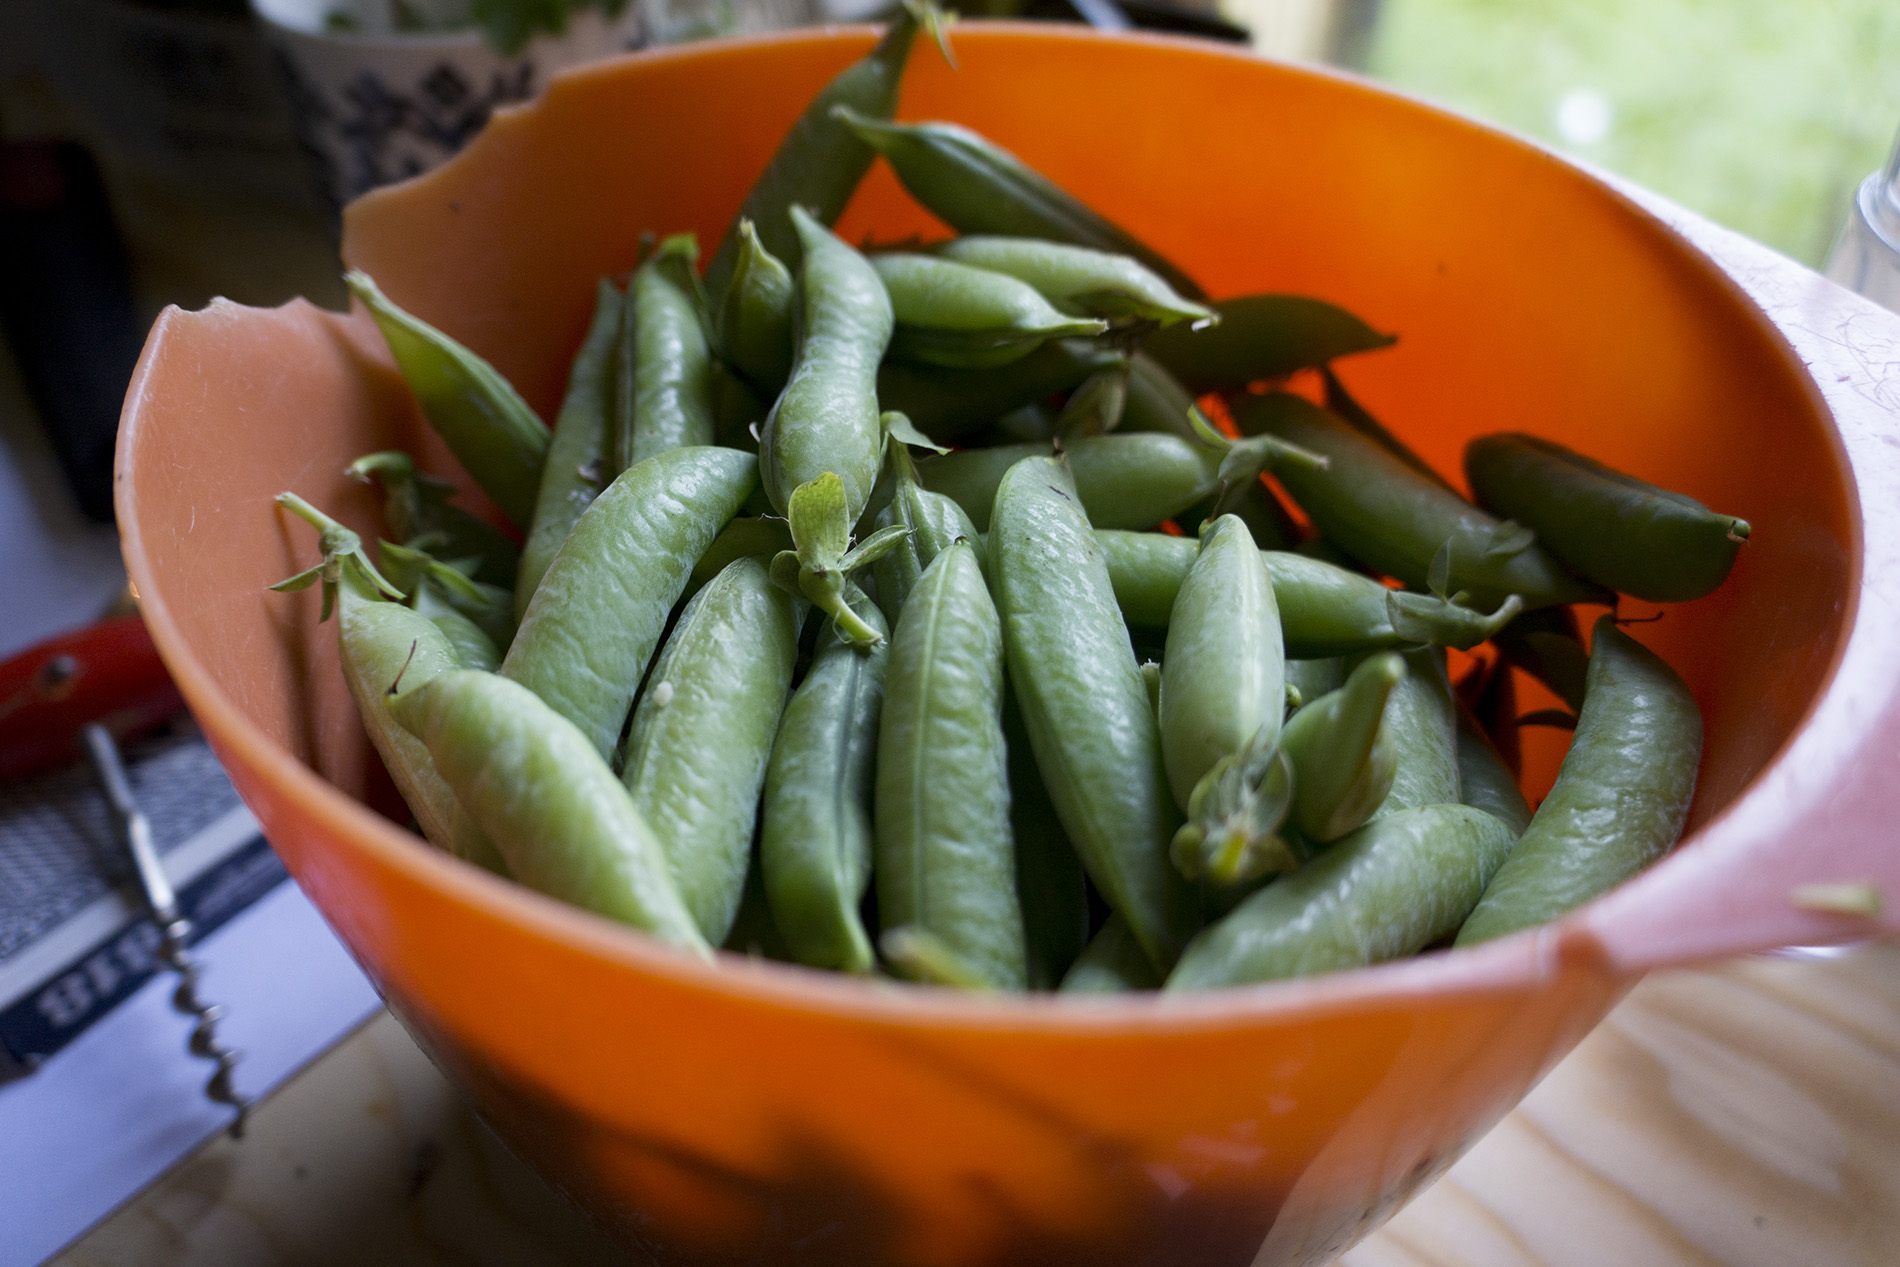 Organic grown peas ready to eat